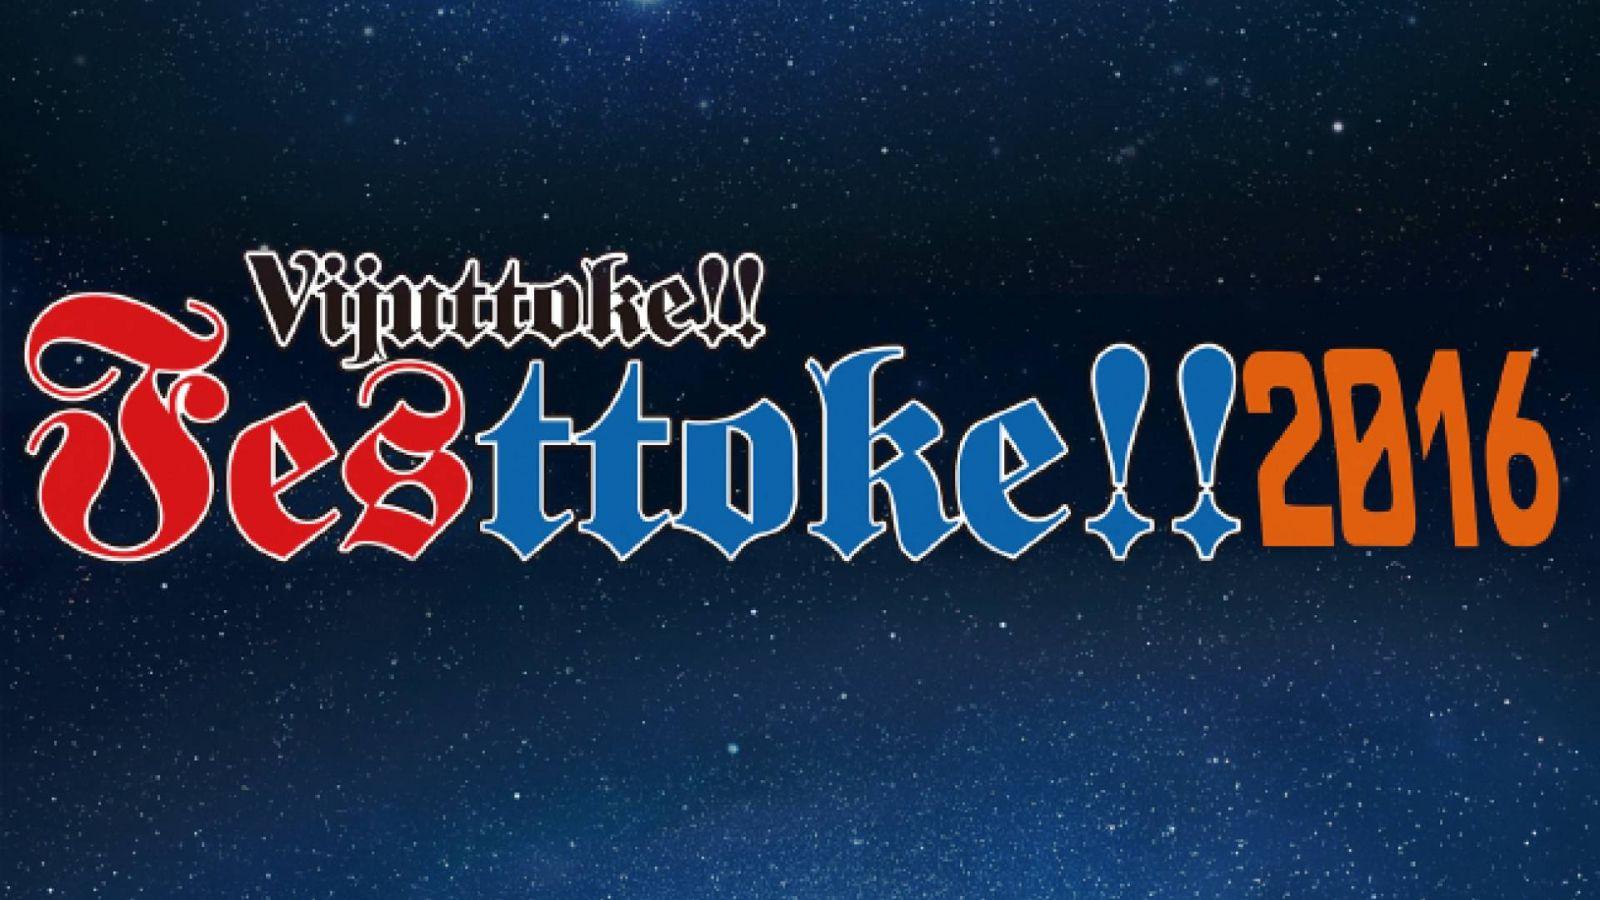 Vijuttoke!!Festokke!!2016 - część 2 © Vijuttoke!! Festtoke!!2016